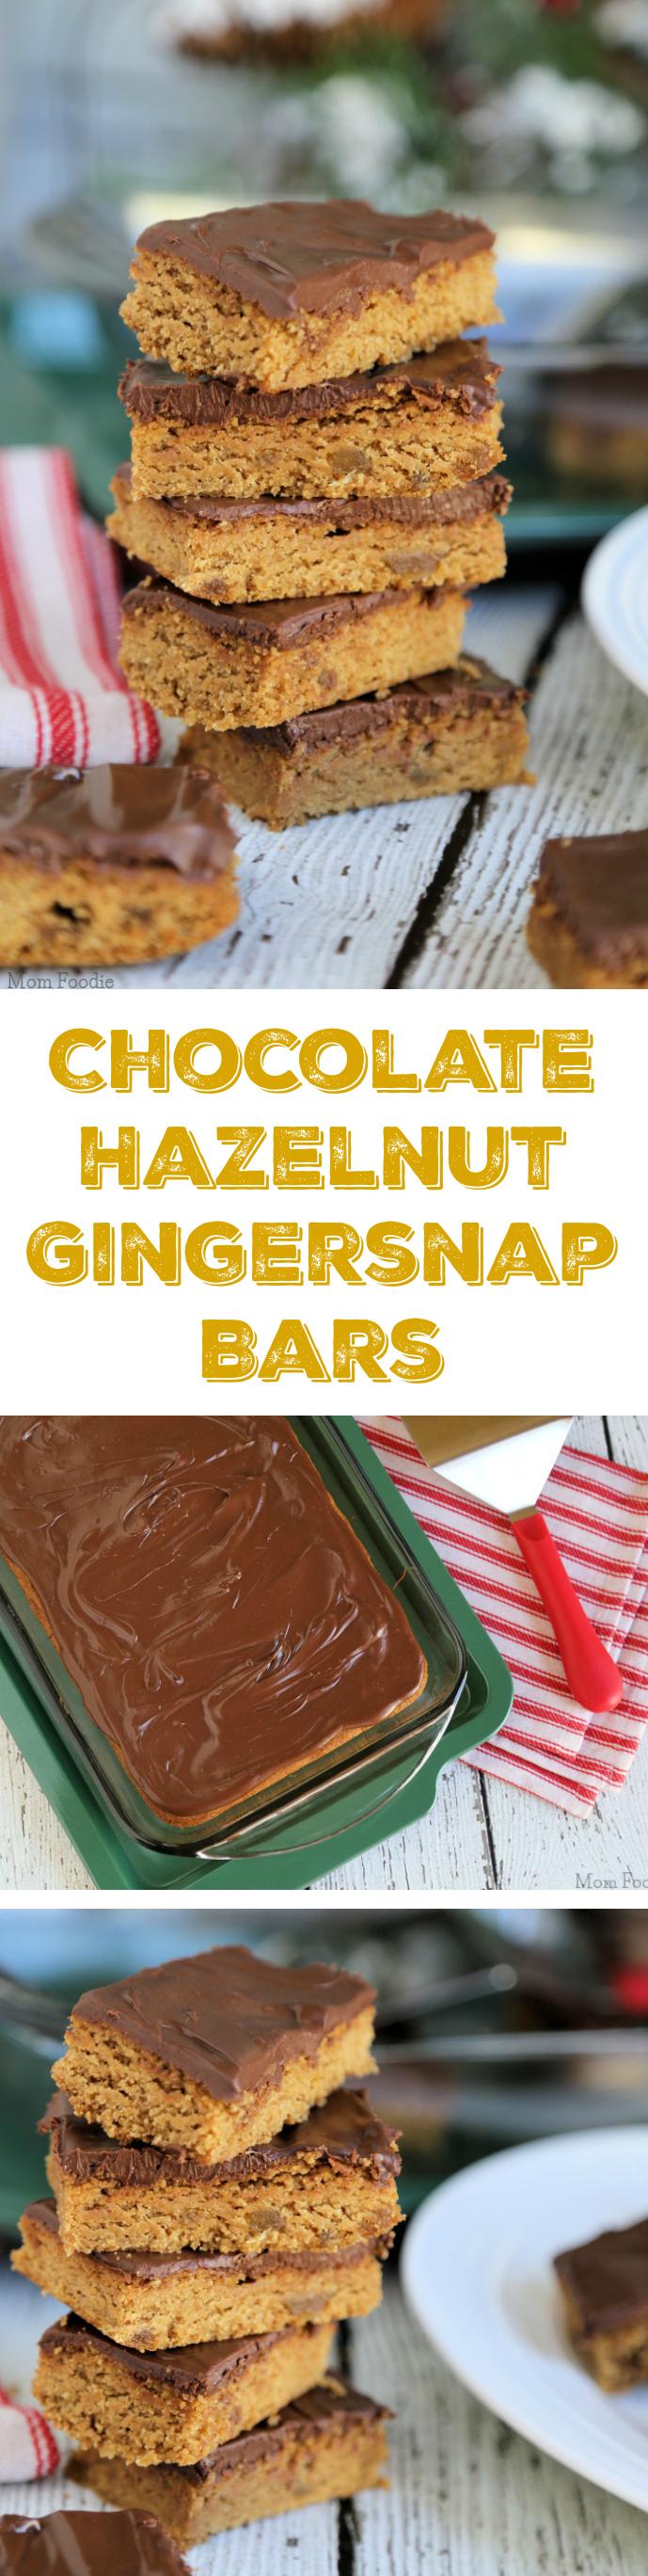 Chocolate Hazelnut Gingersnap Bars - Mom Foodie